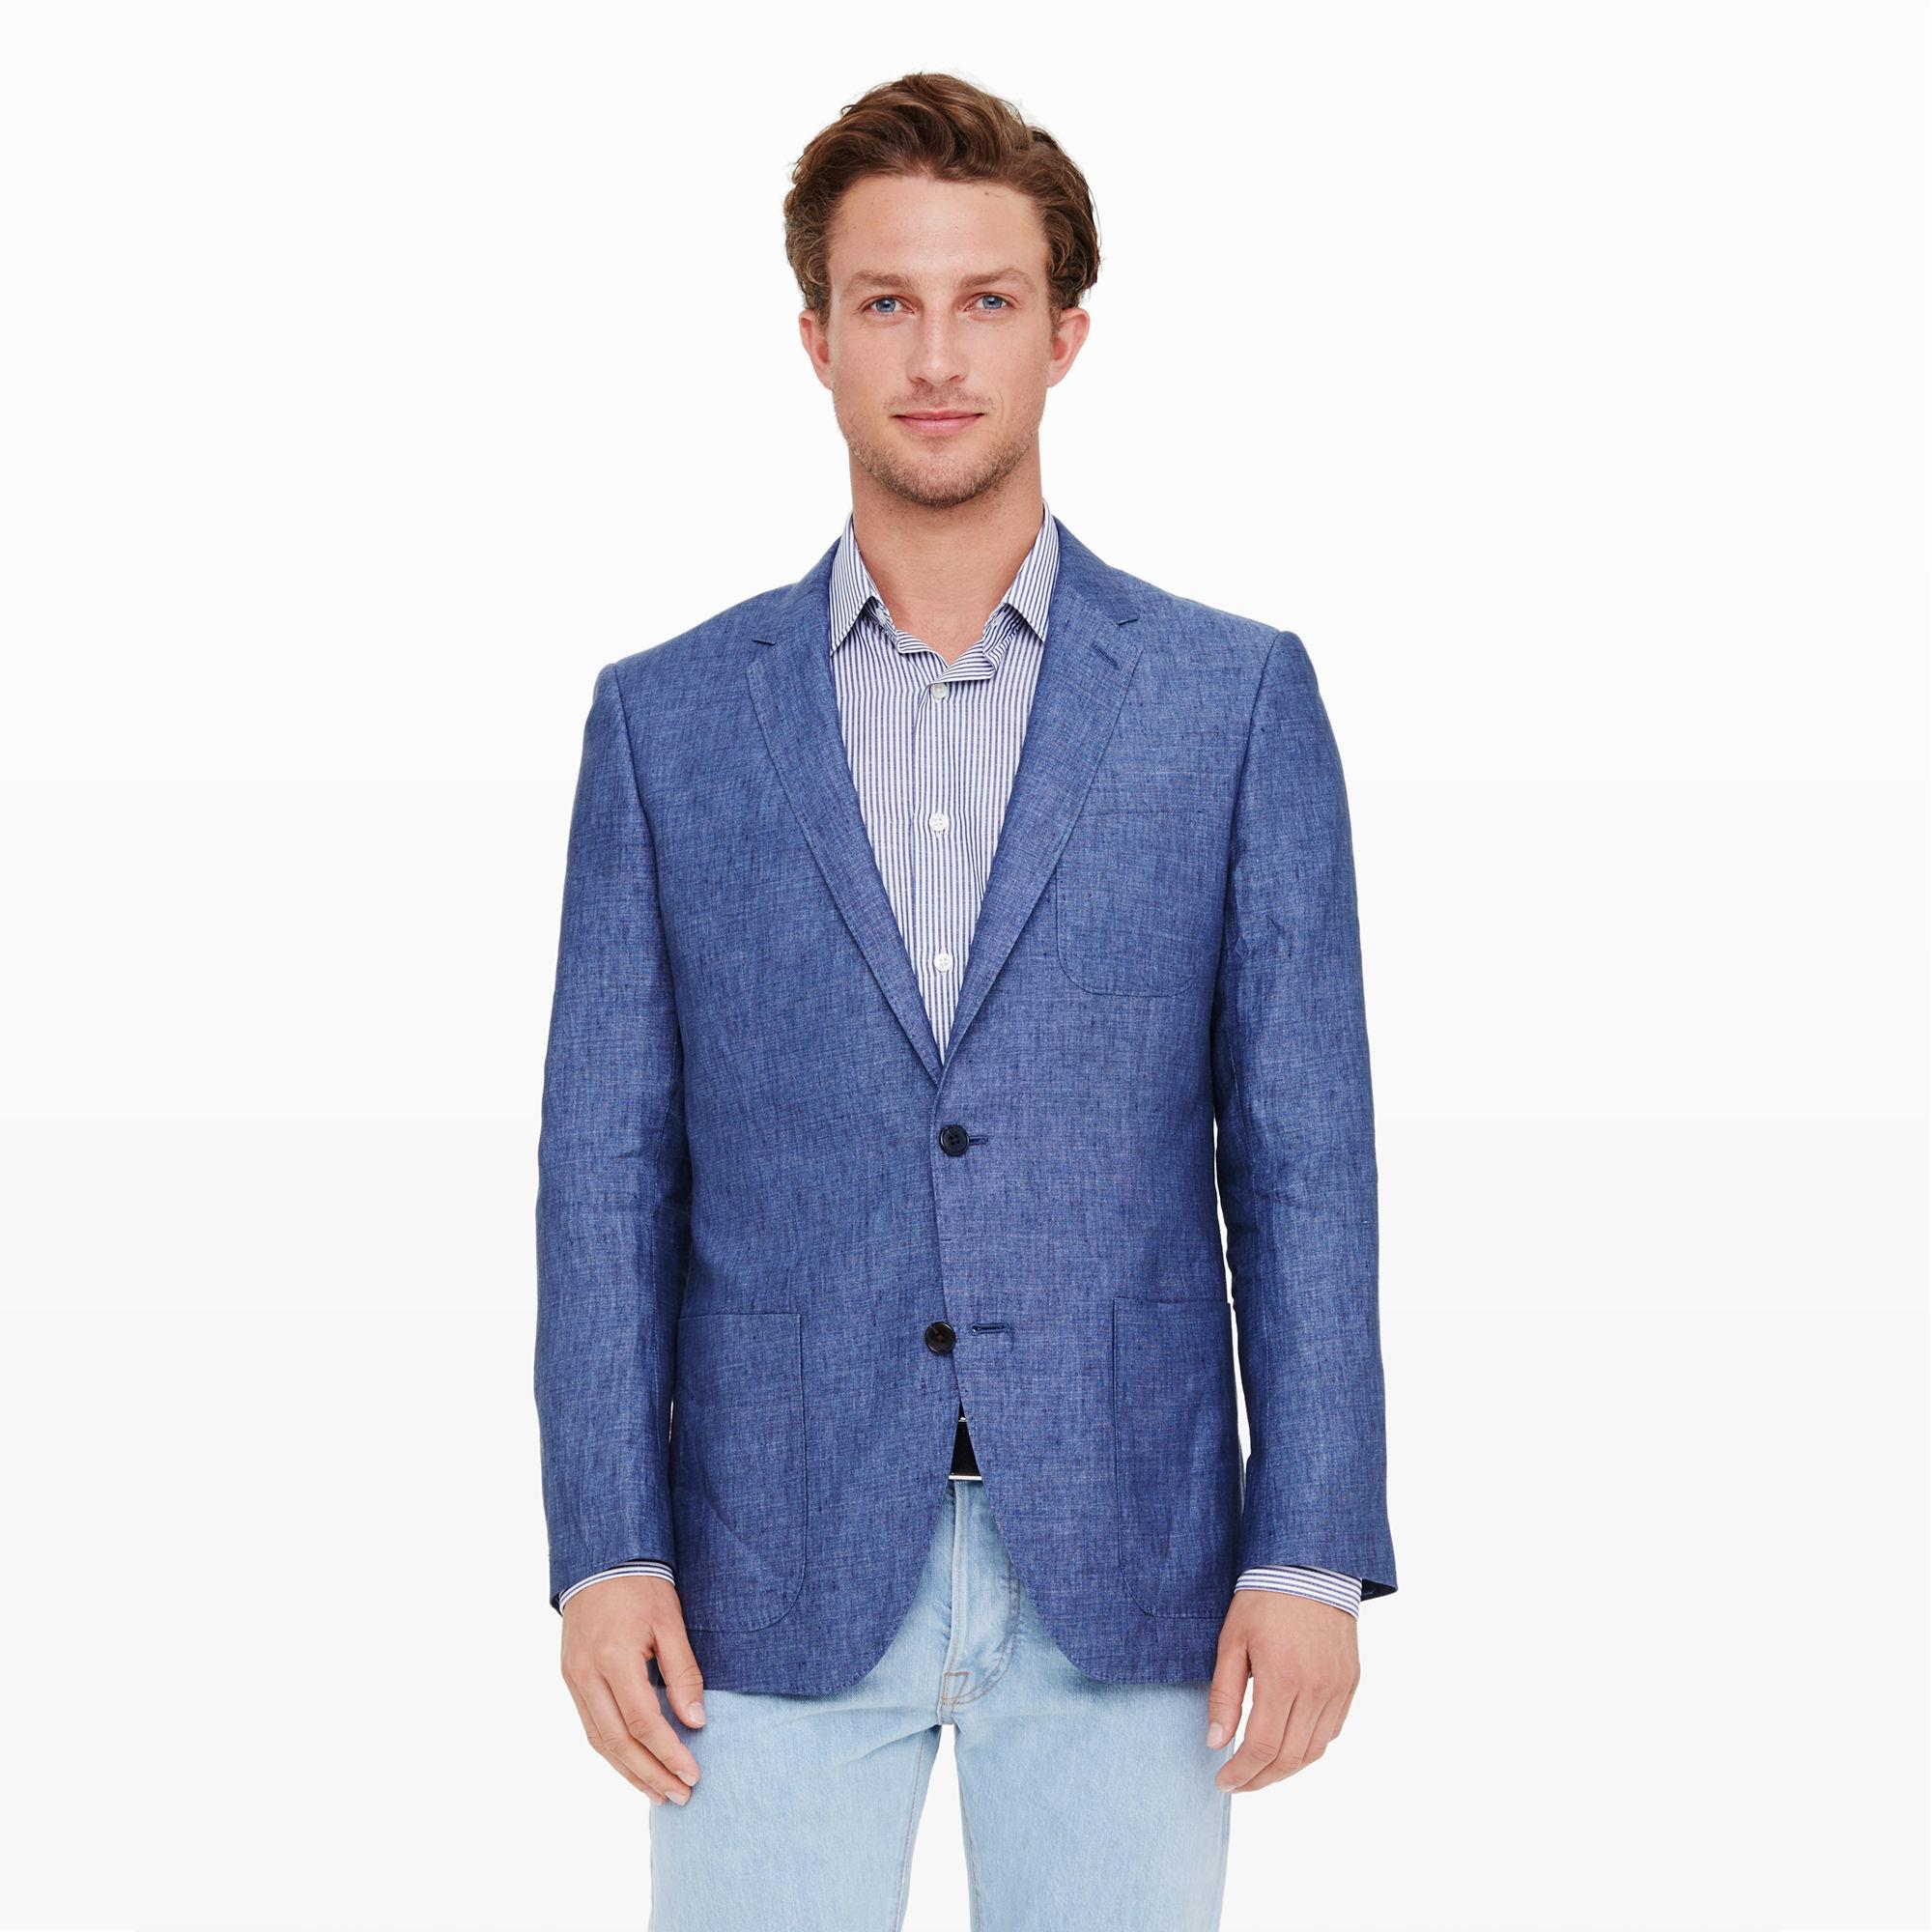 eec8fc5c3337 Club Monaco New Grant Linen Blazer in Blue for Men - Lyst